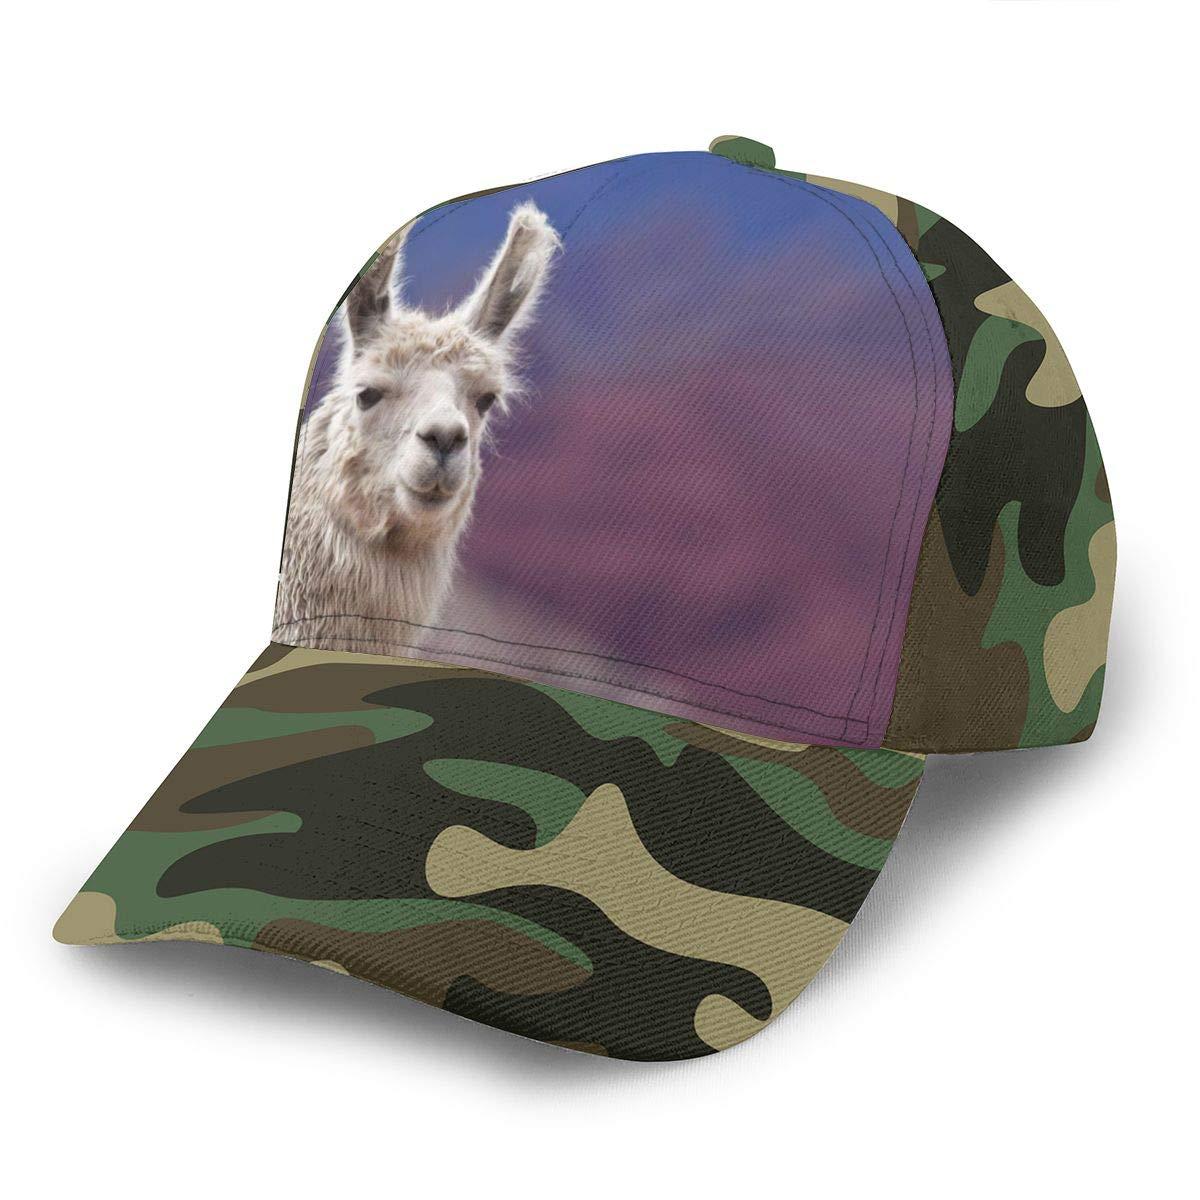 Y94OIW@MAO Llama Baseball Cap for Unisex Cotton Mountaineering Cap